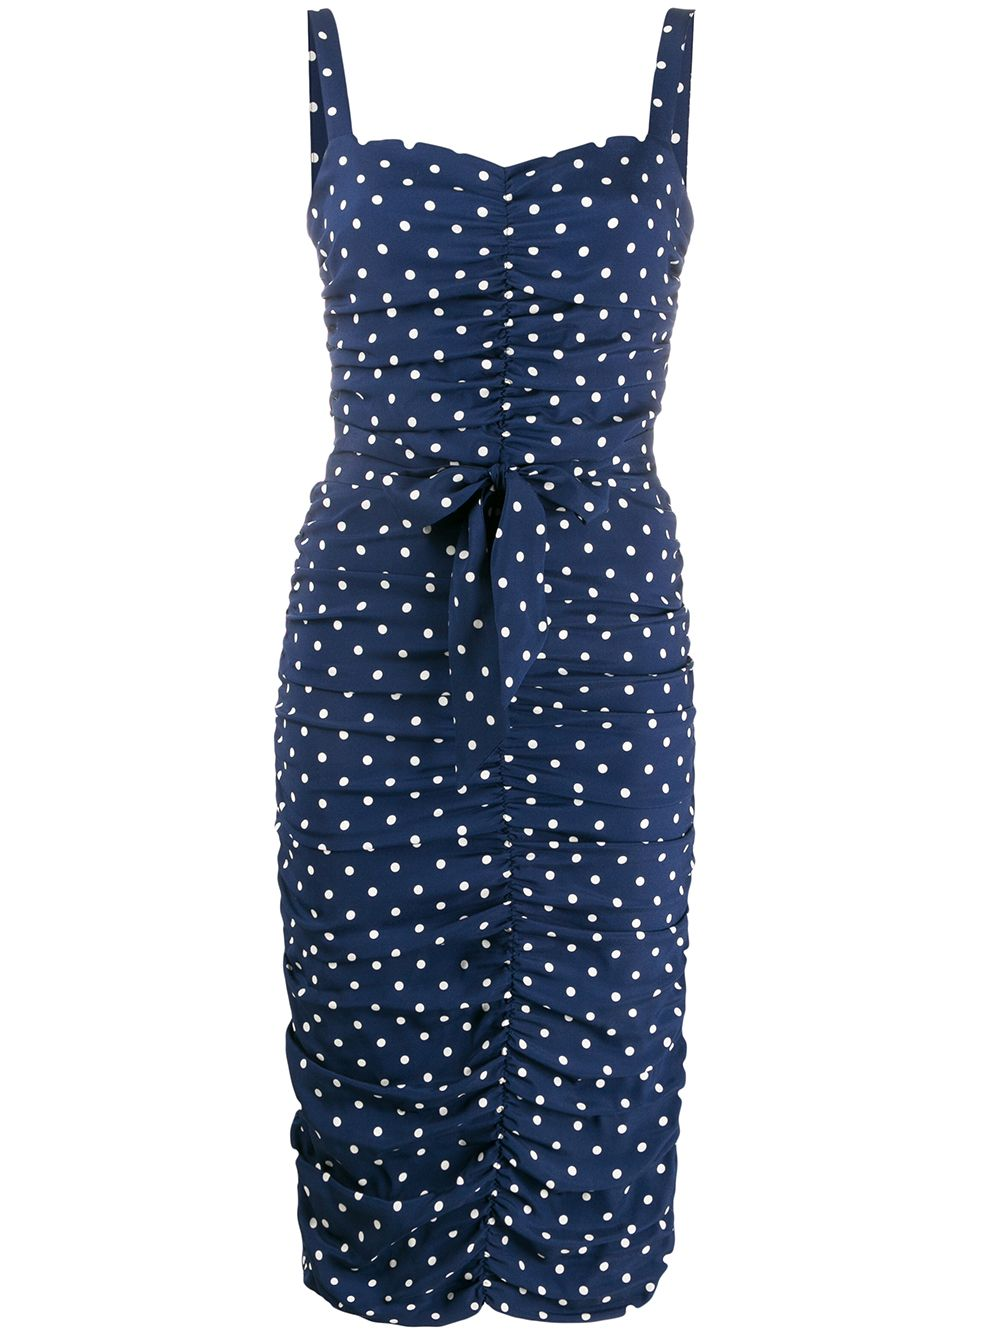 Midnight blue stretch silk polka dot print dress   P.A.R.O.S.H. |  | D723076-SOIS812